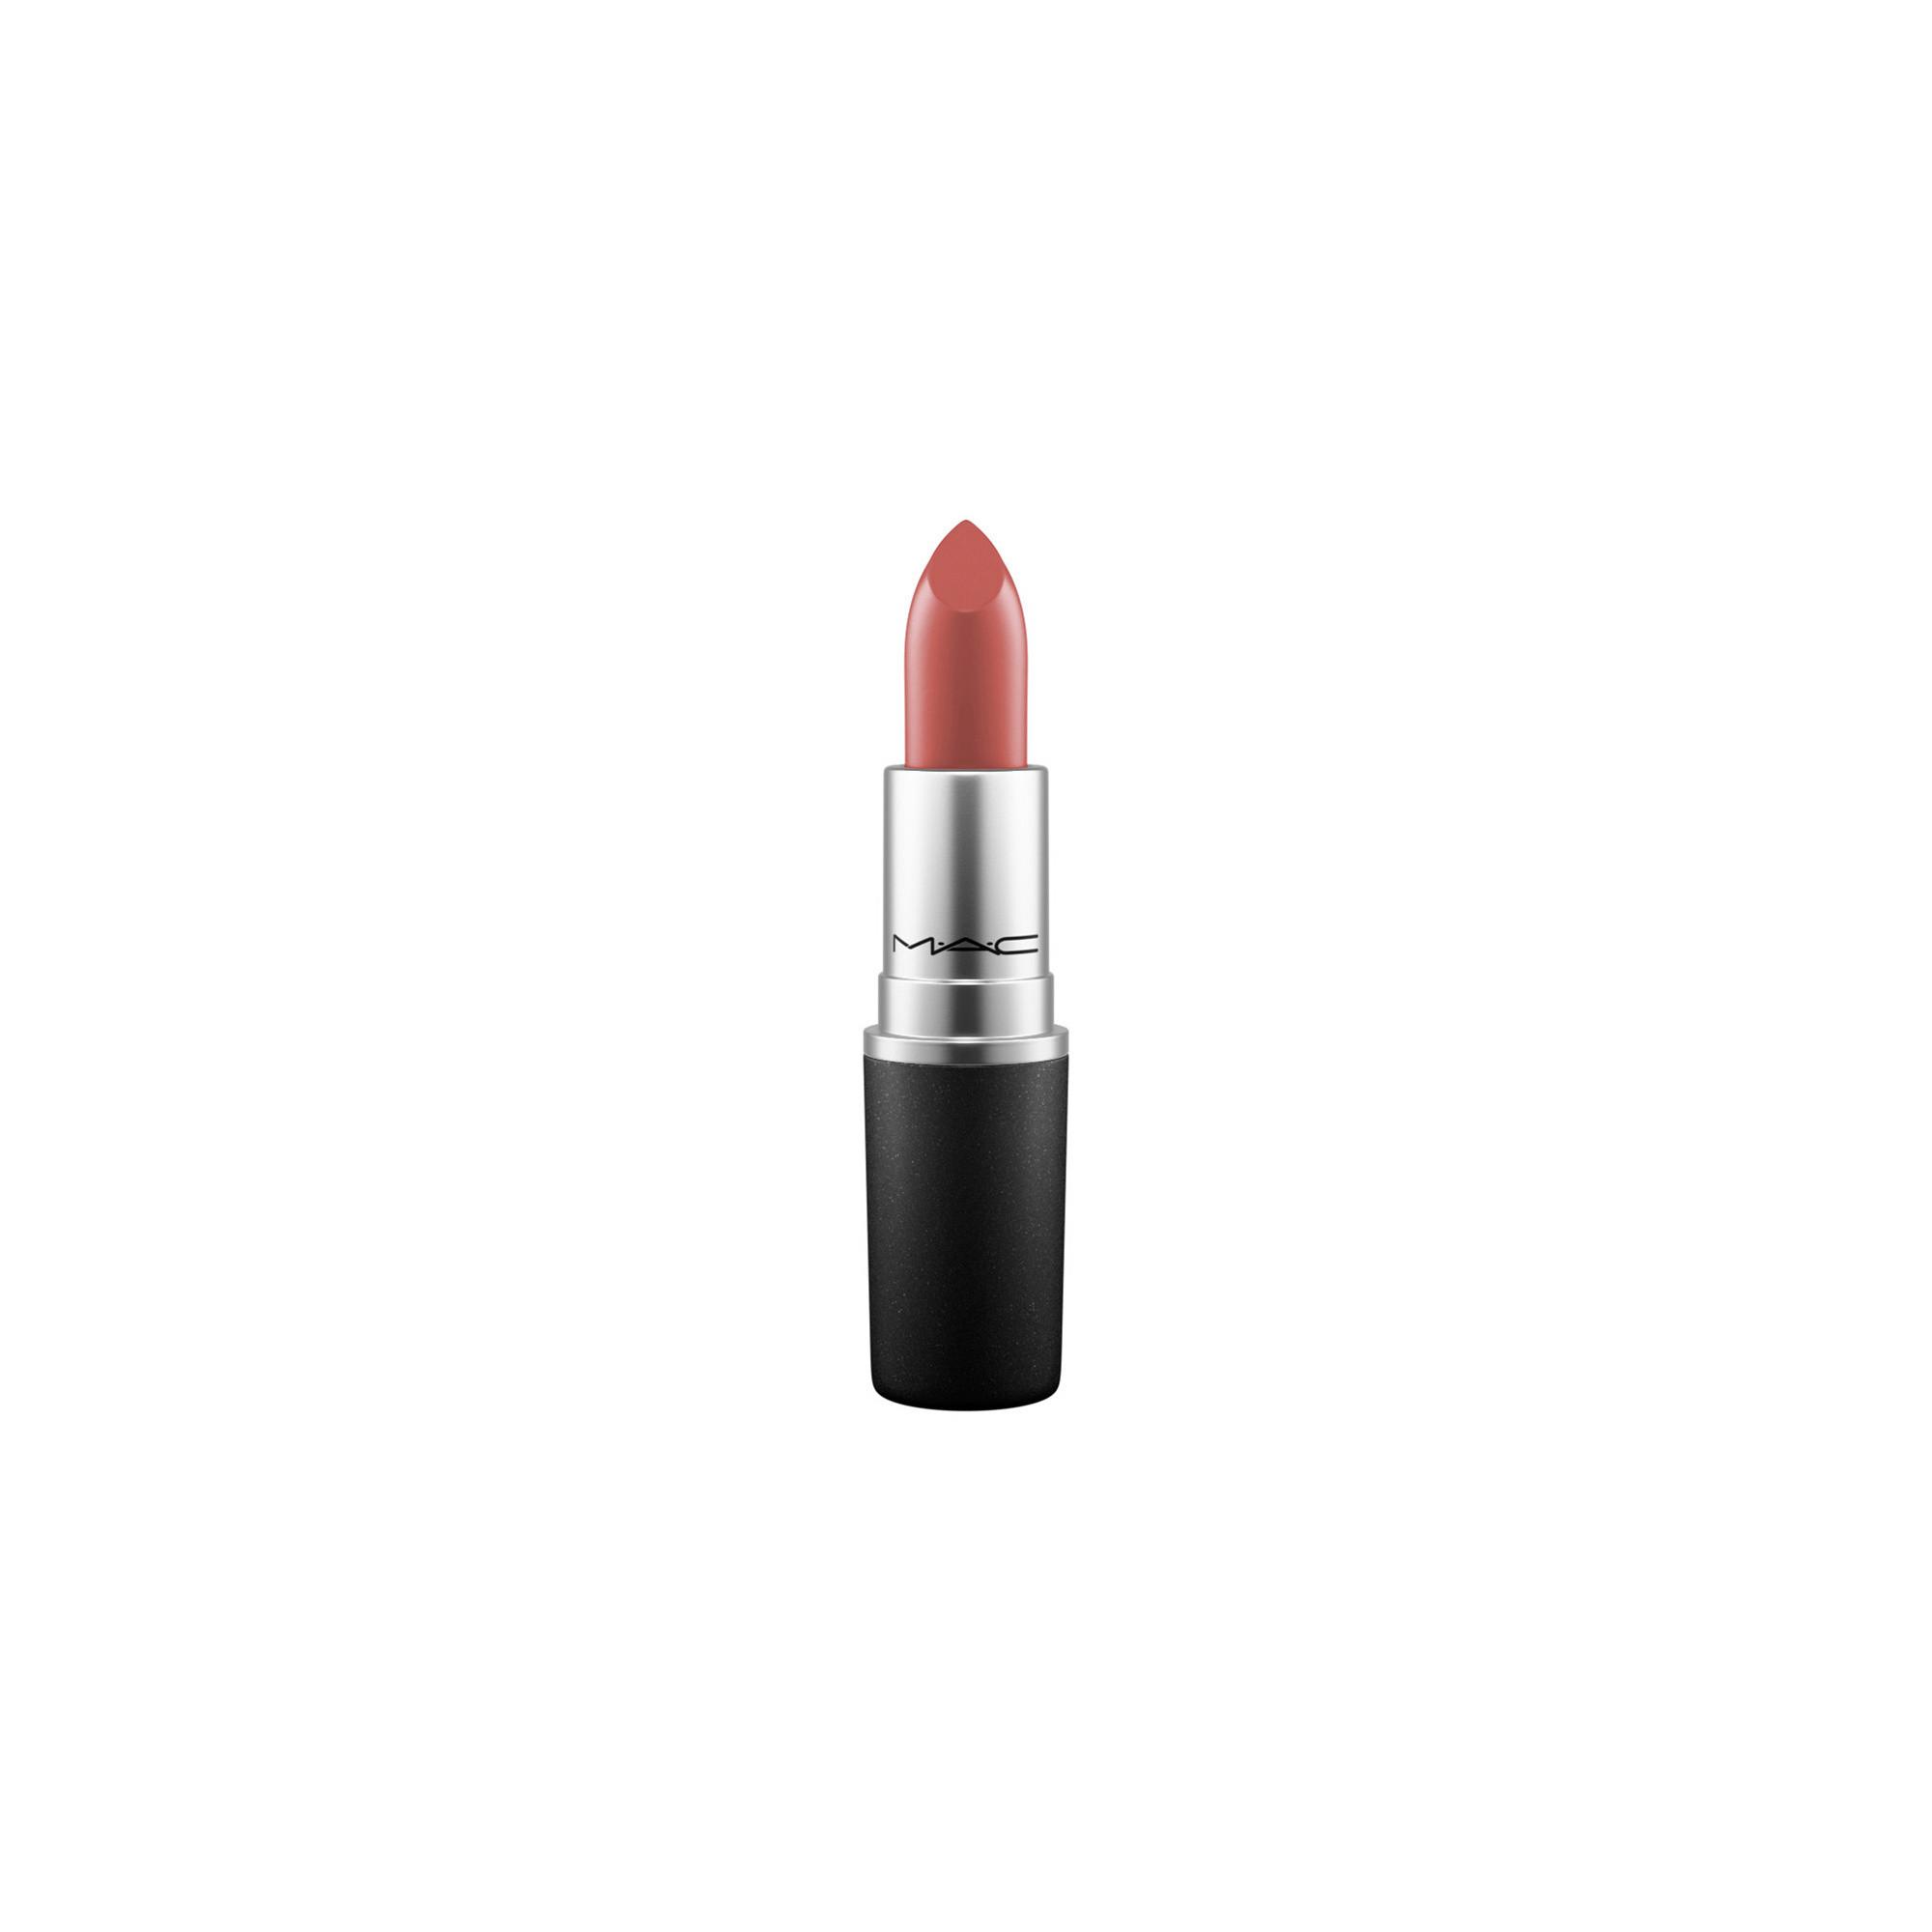 Satin Lipstick - Retro, RETRO, large image number 0